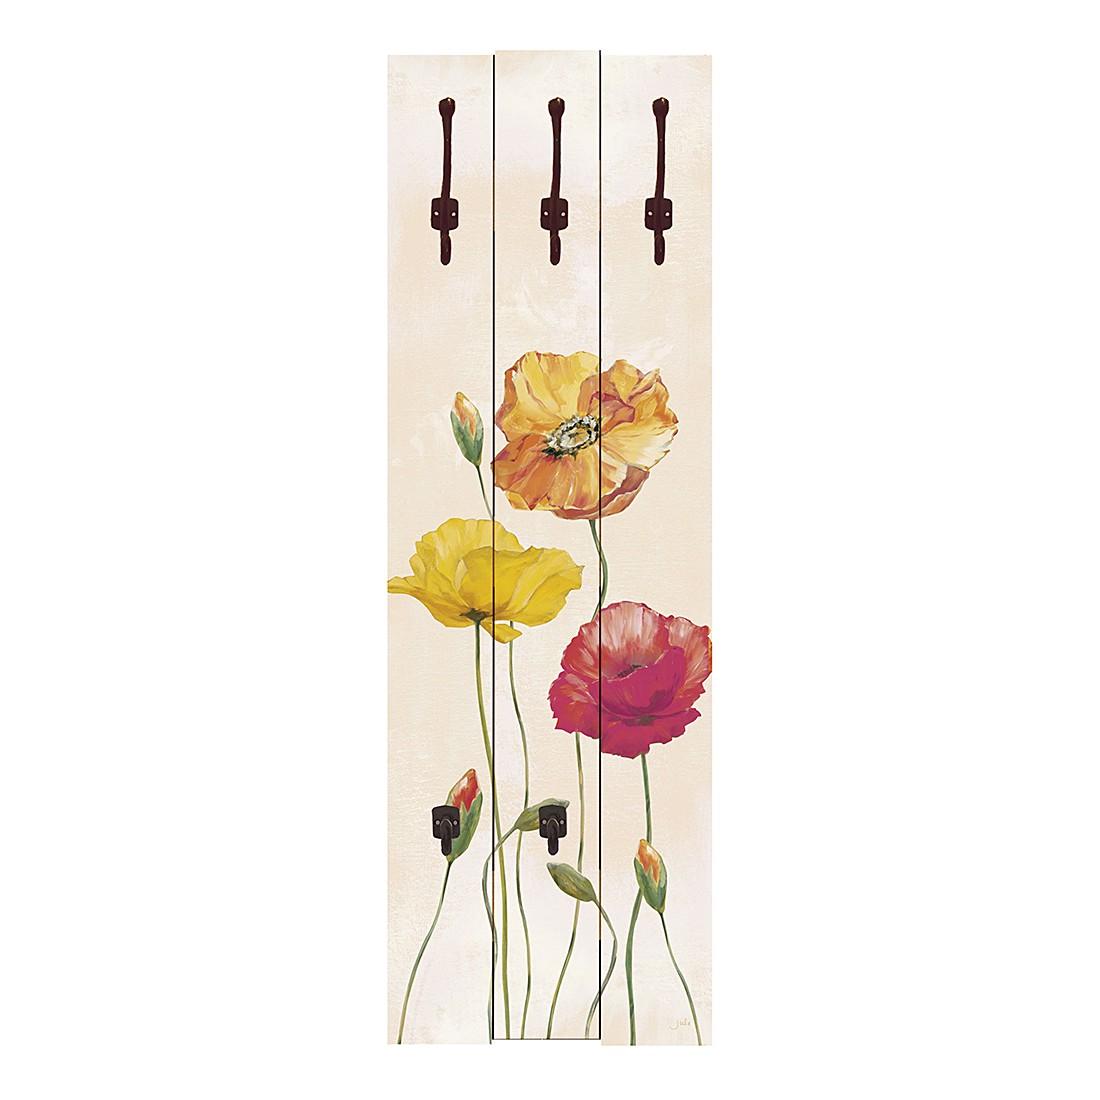 Garderobe Colorful Poppies – Floral, Artland günstig